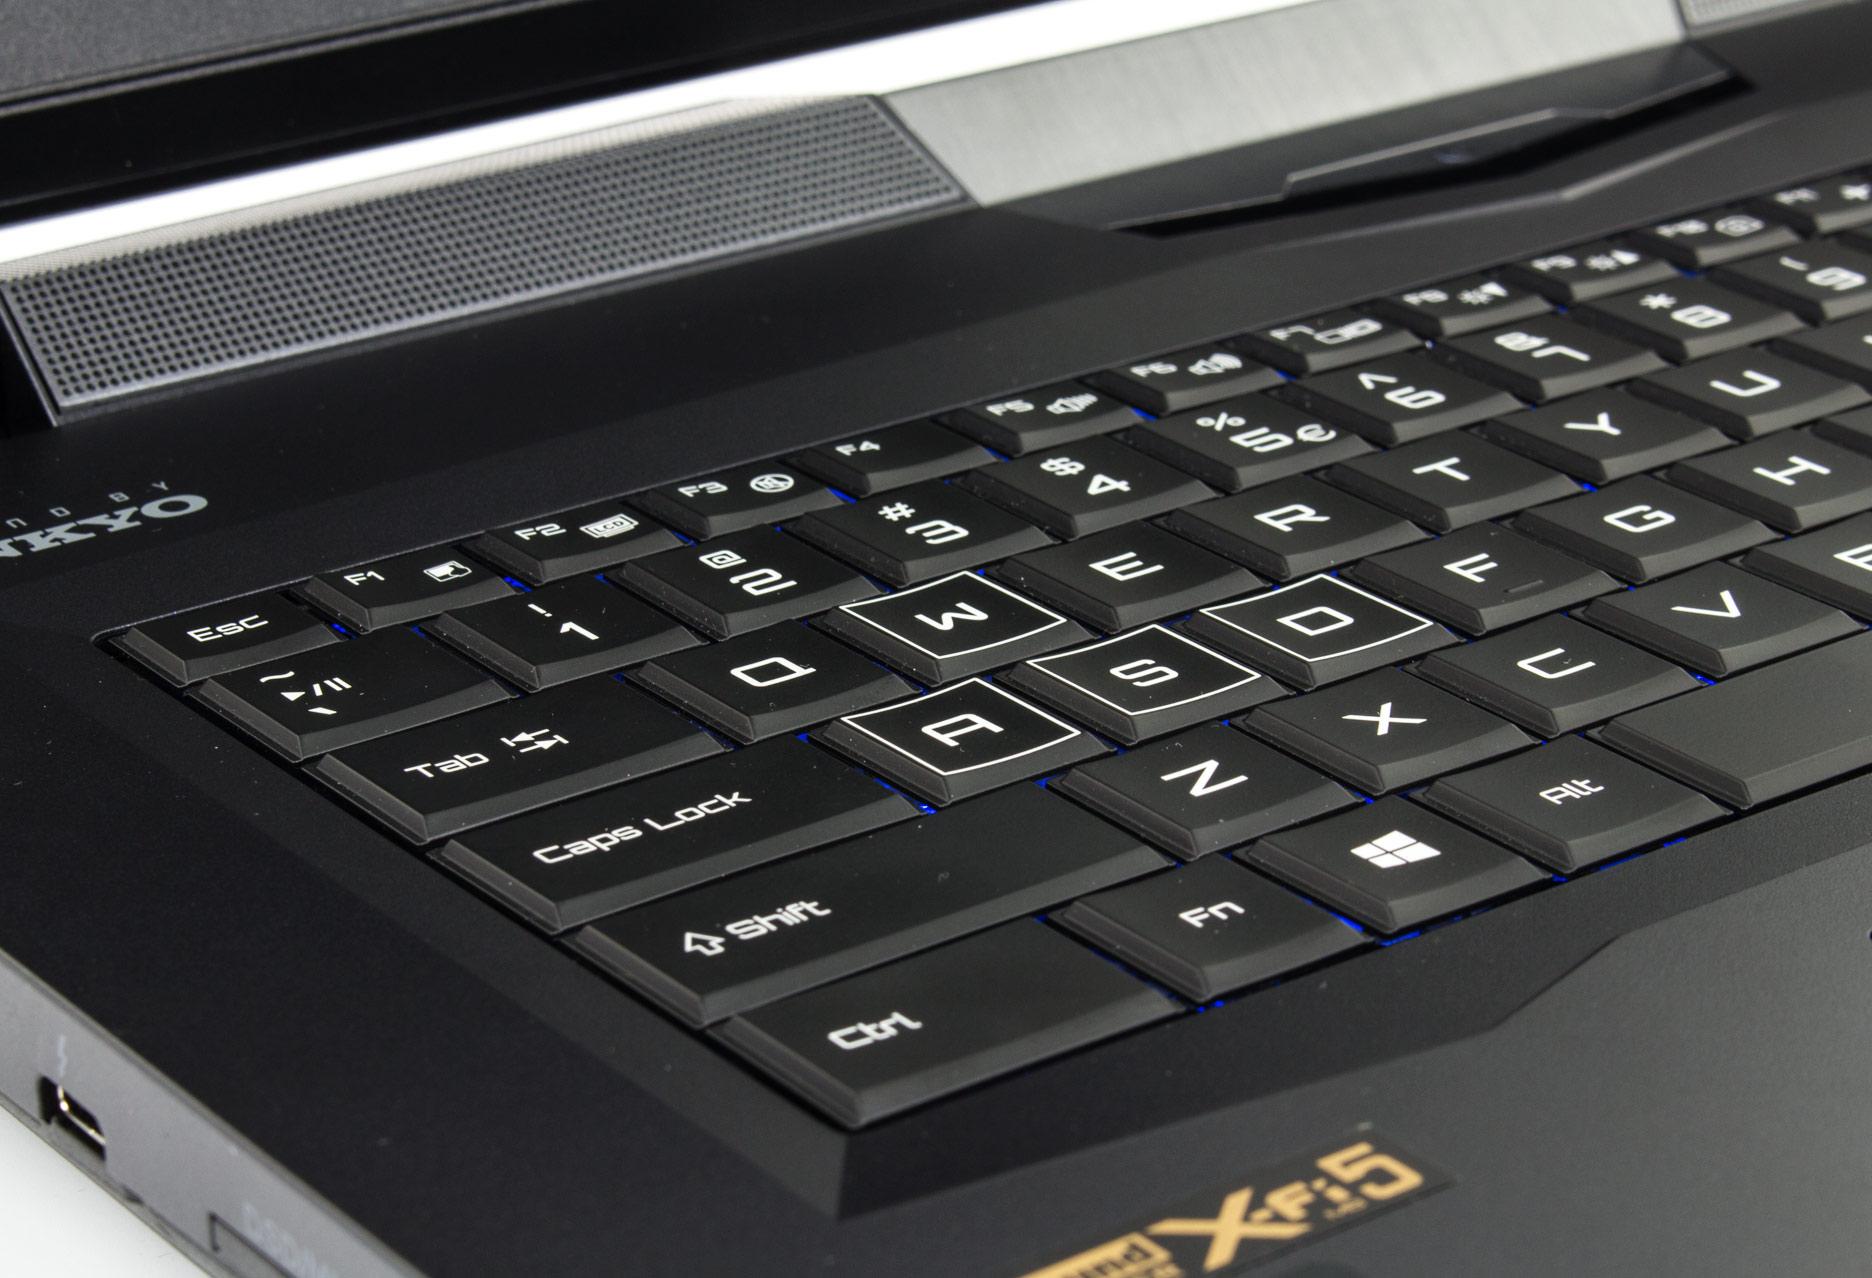 Hyperbook X77DM-G WASD